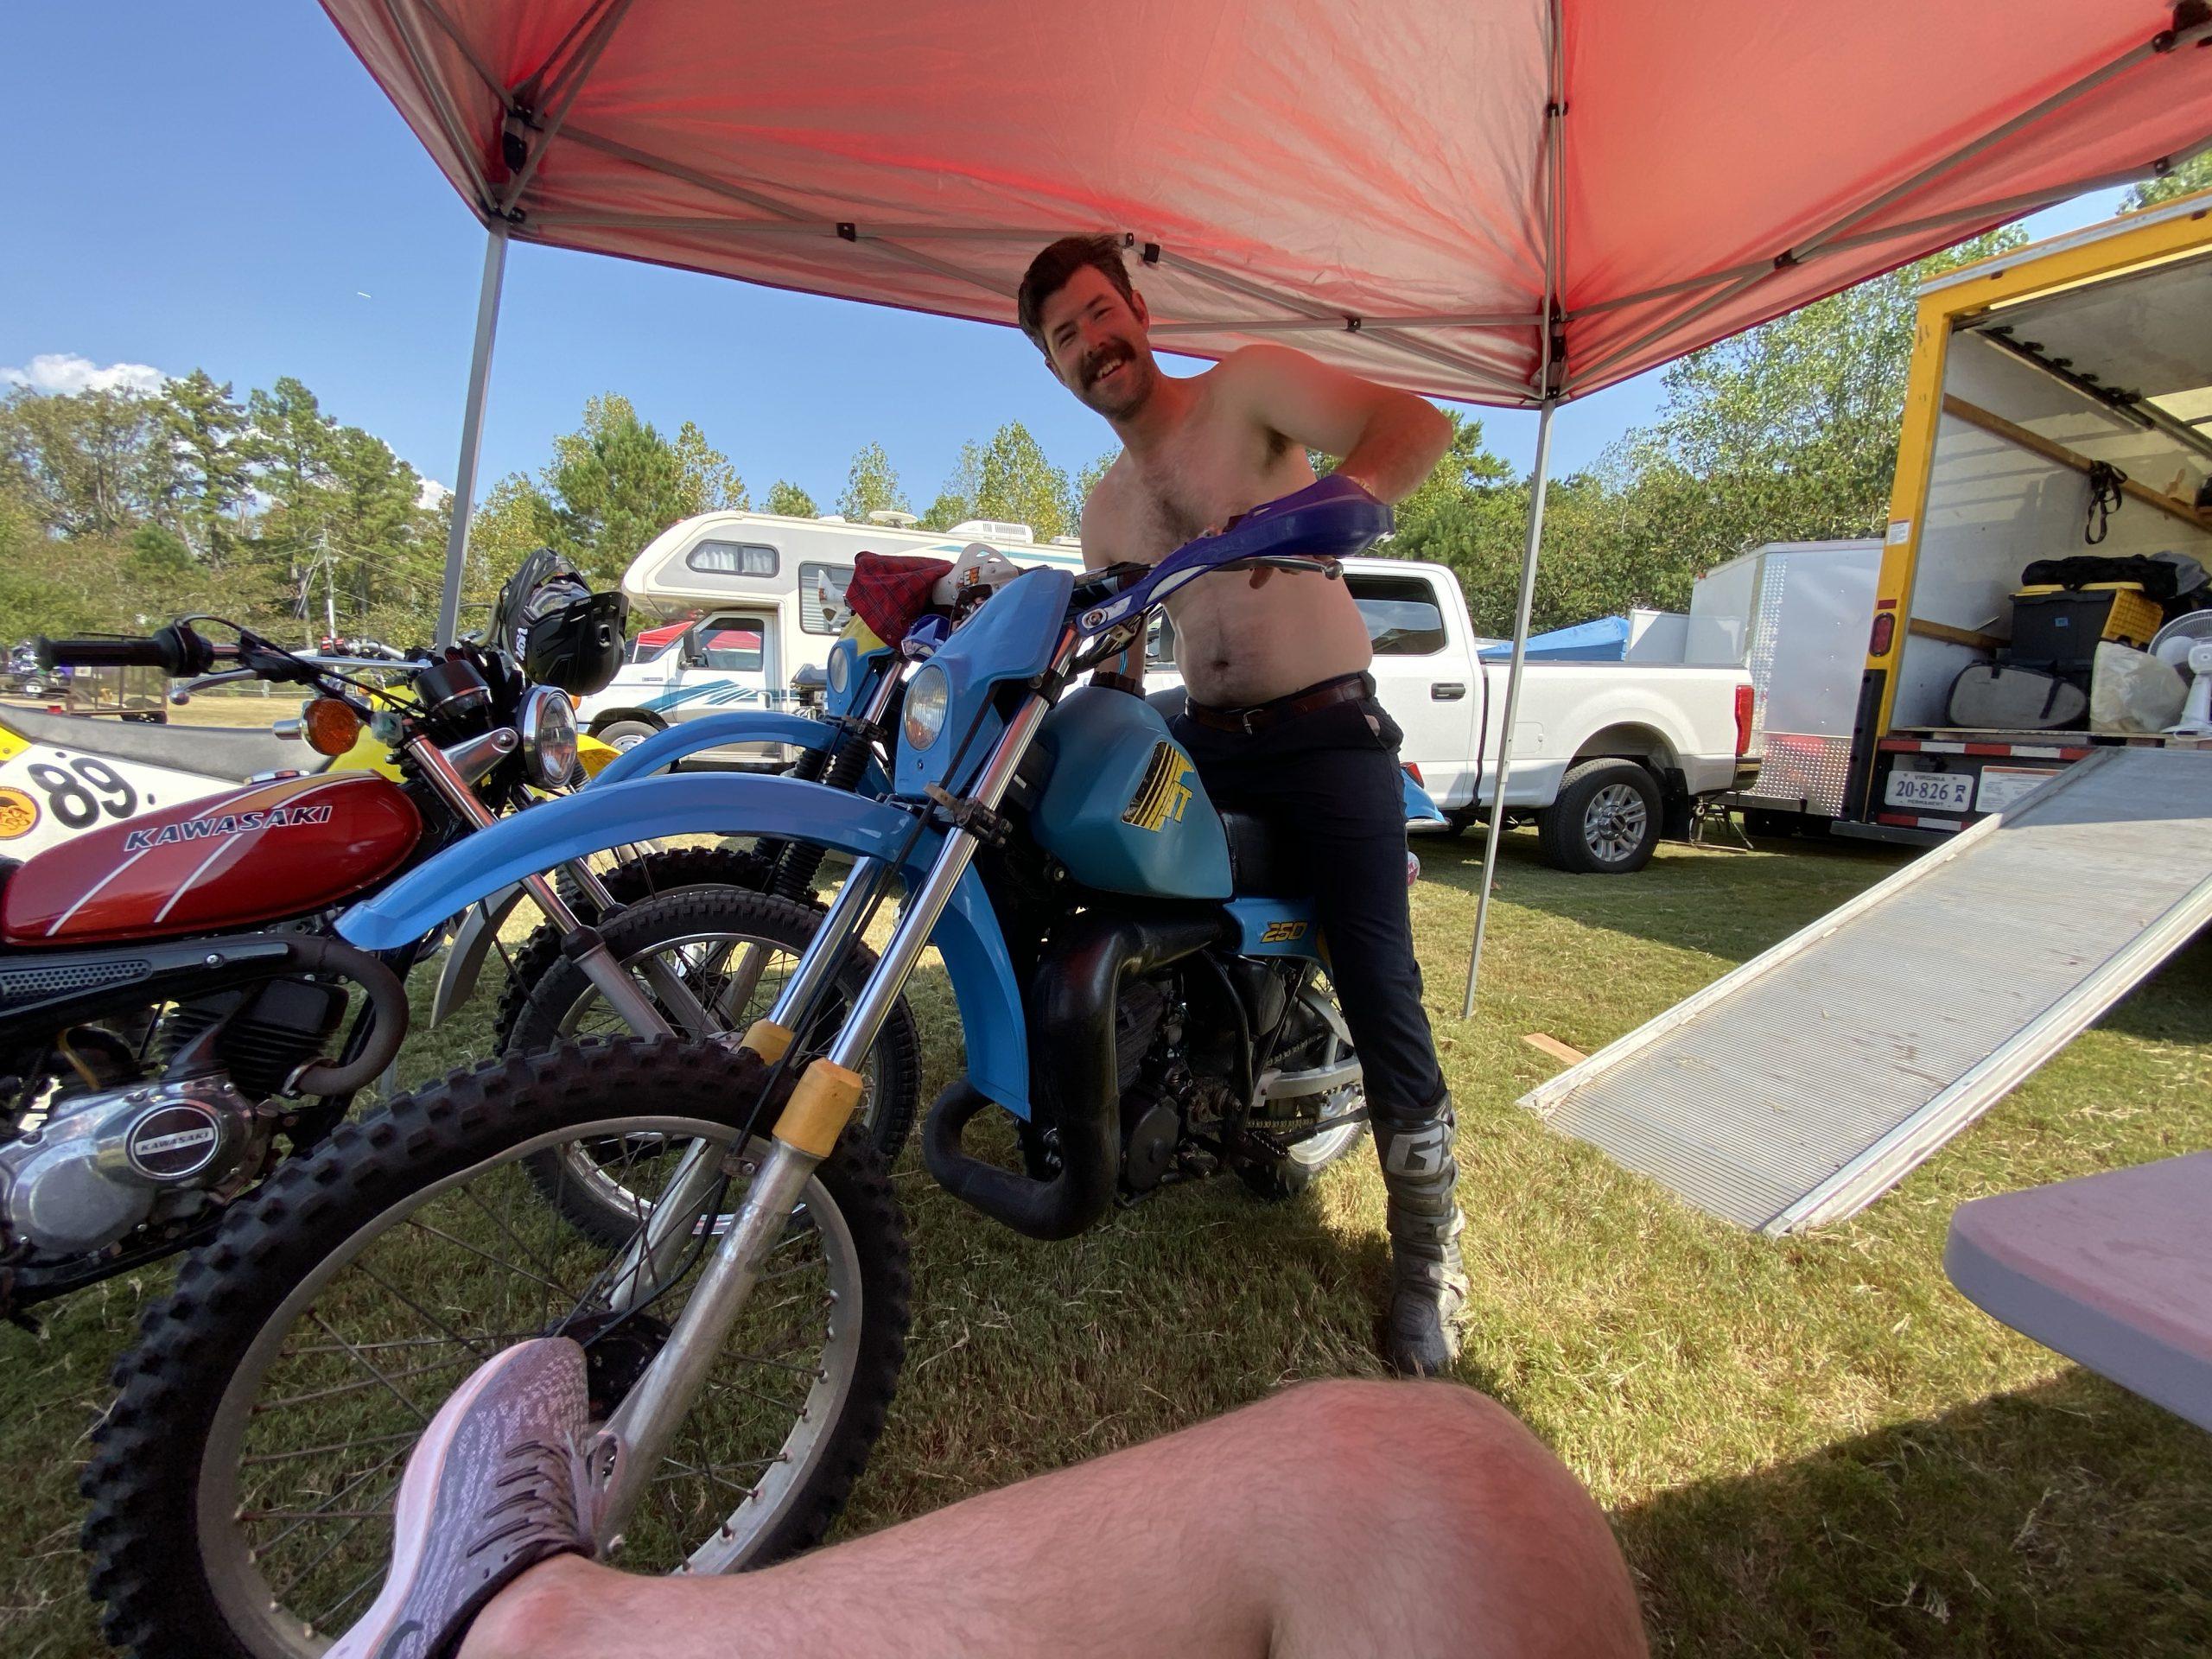 2019 Barber Vintage Festival Rider With Moto